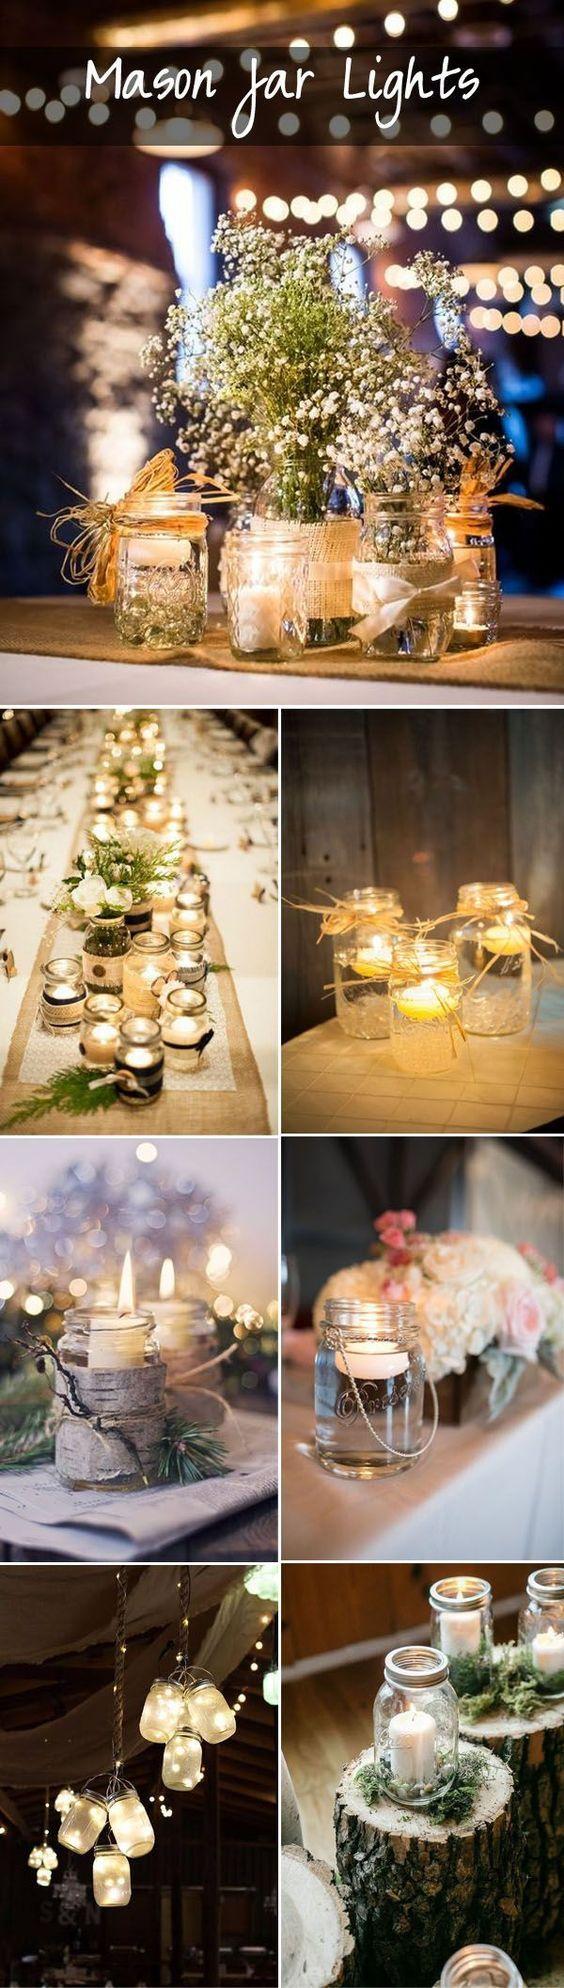 best rustic wedding ideas with mason jars rustic mason jars